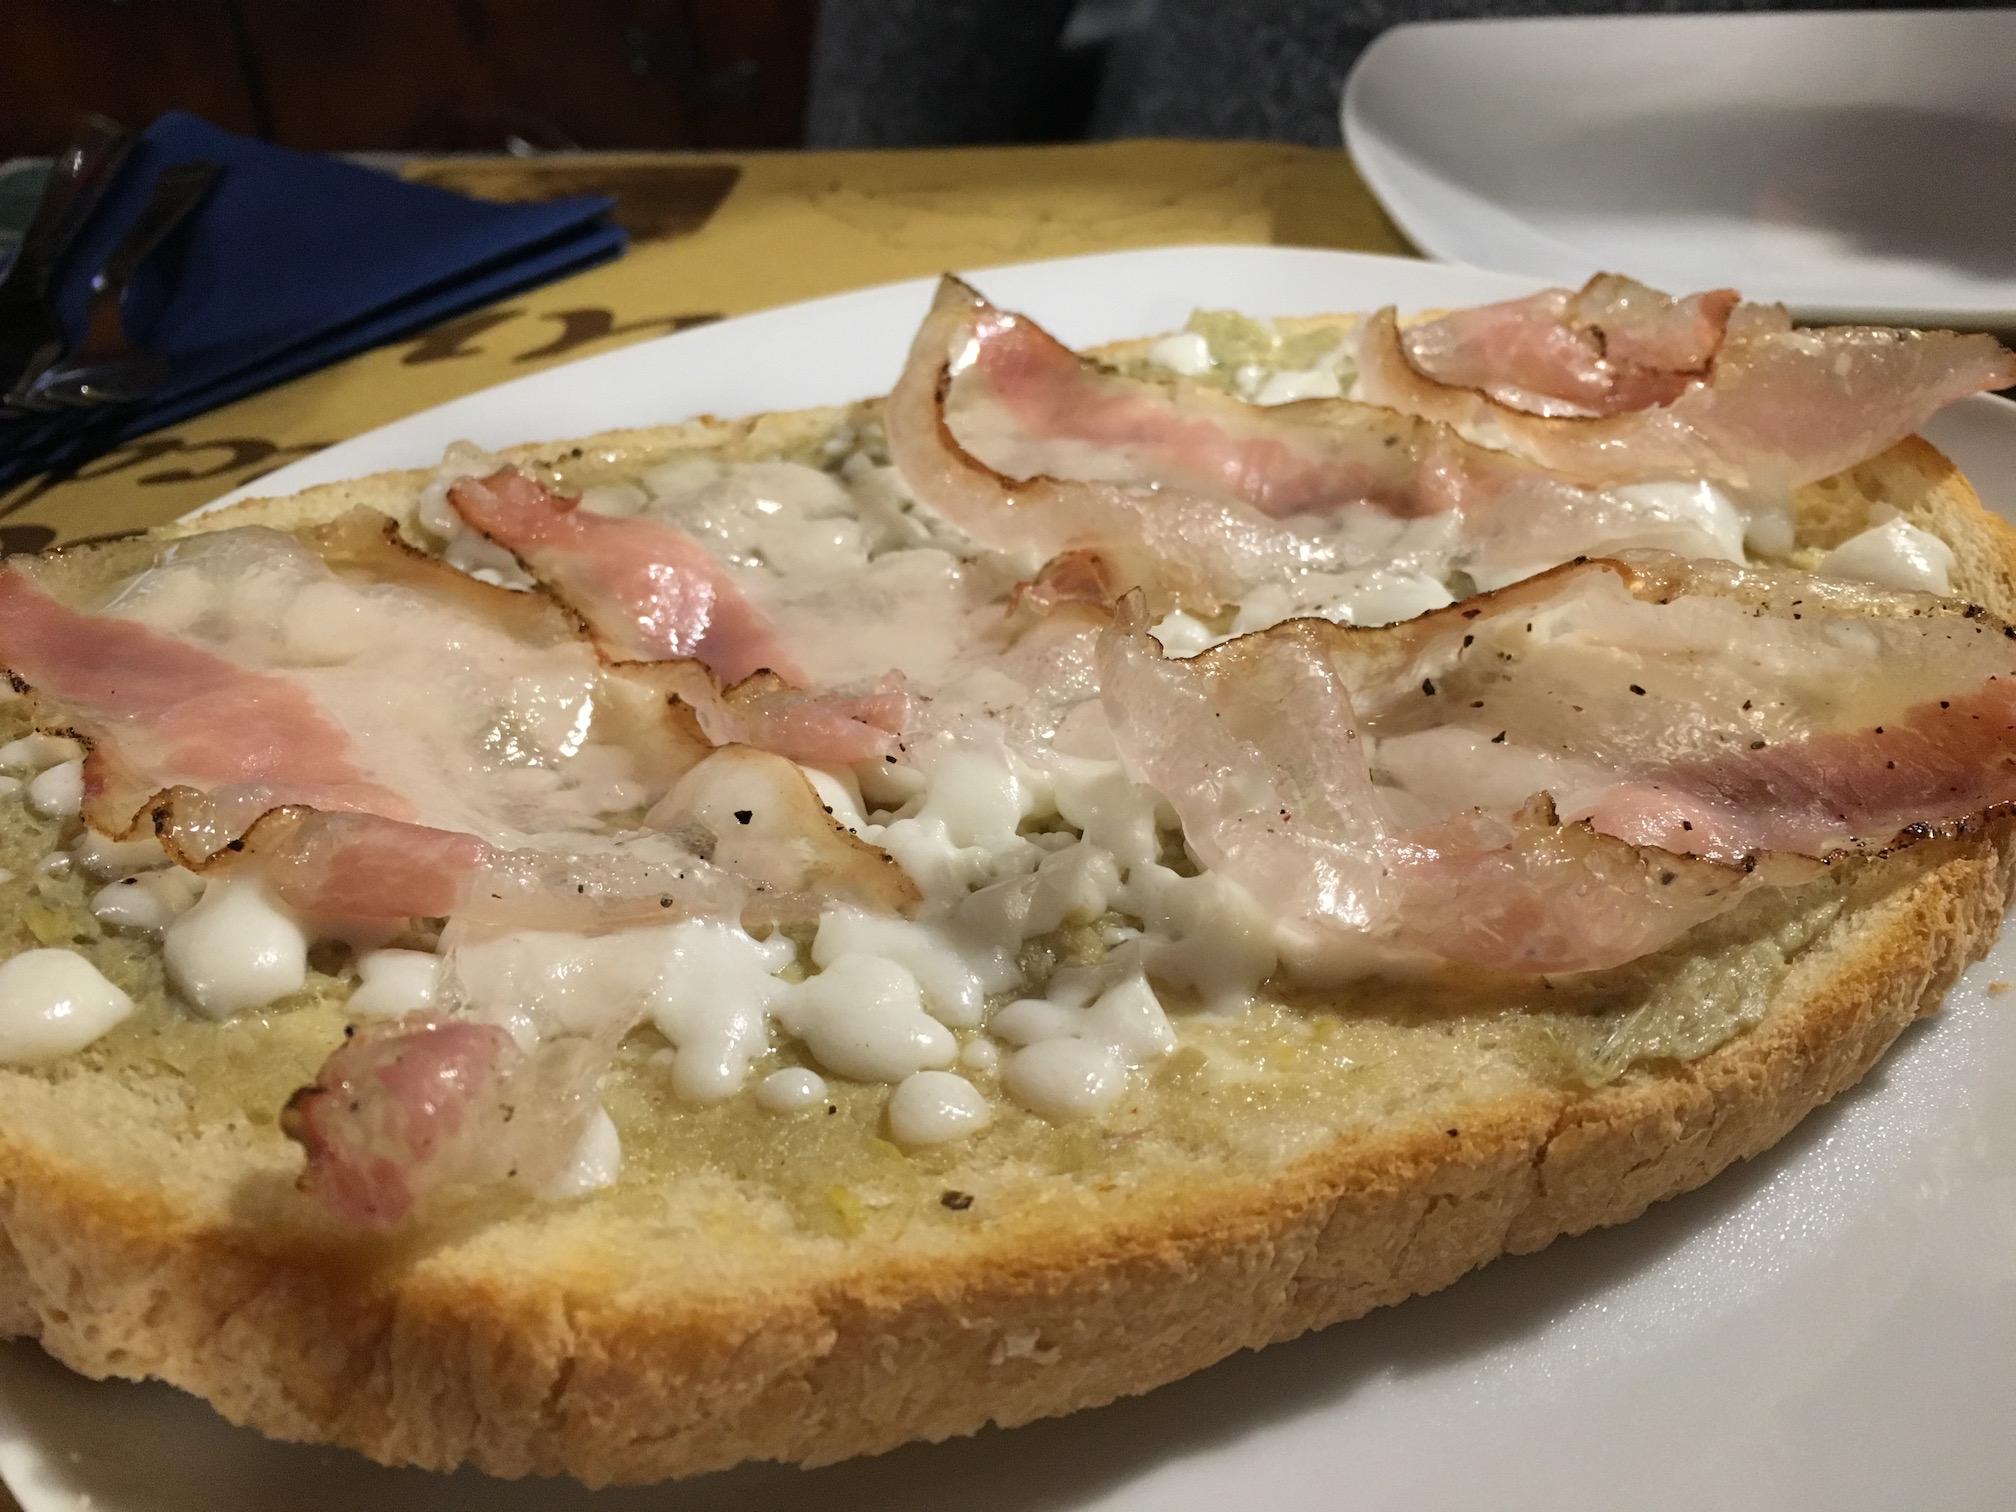 Bruschetta with artichoke and bacon